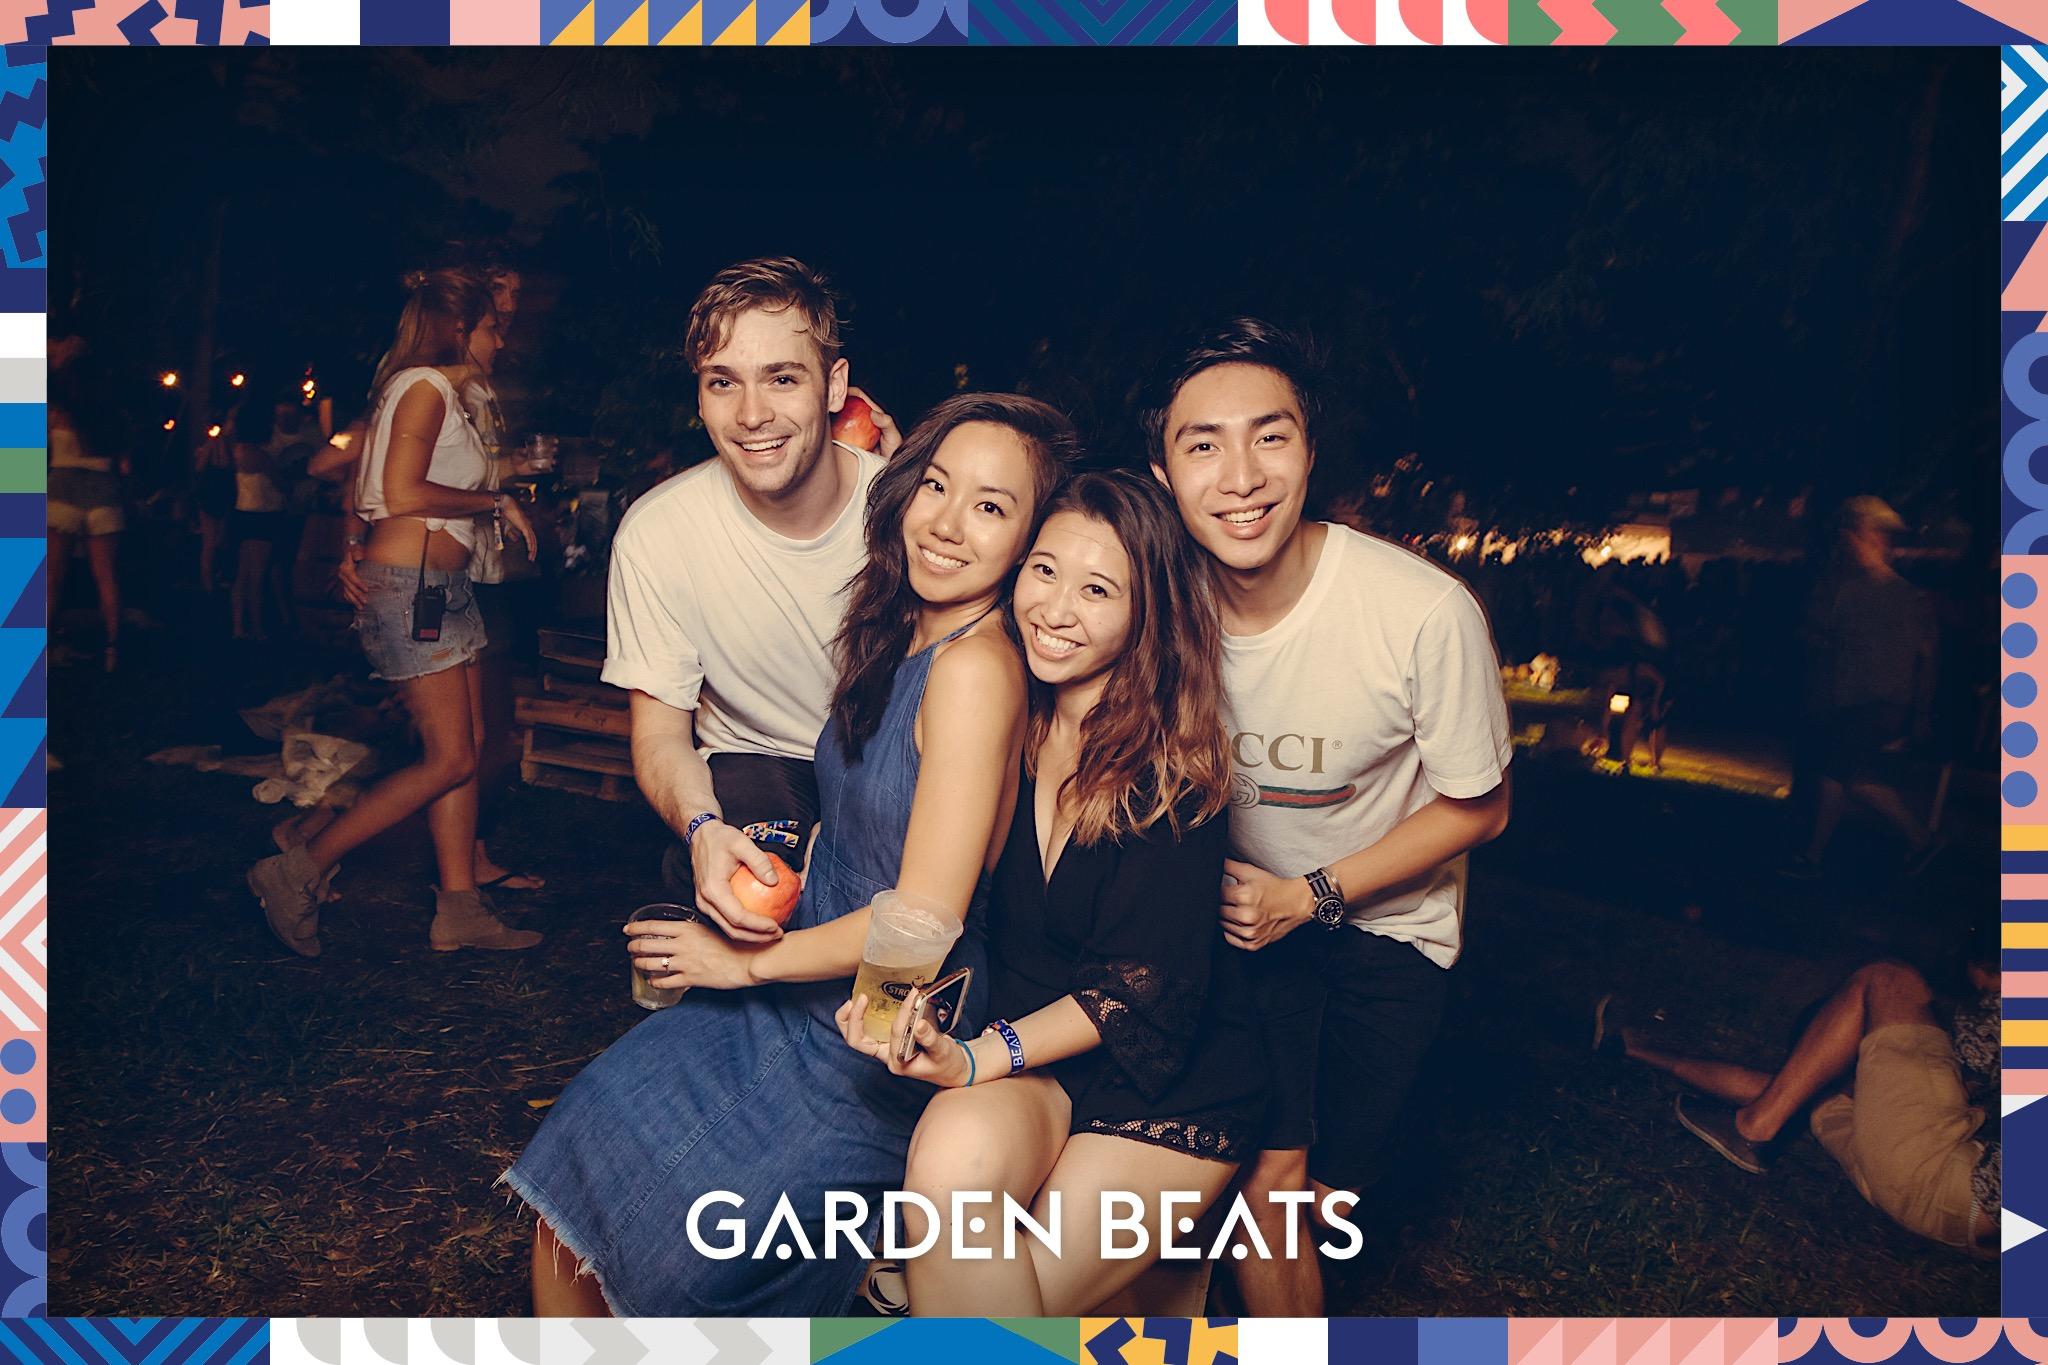 18032017_GardenBeats_Colossal856_WatermarkedGB.jpg